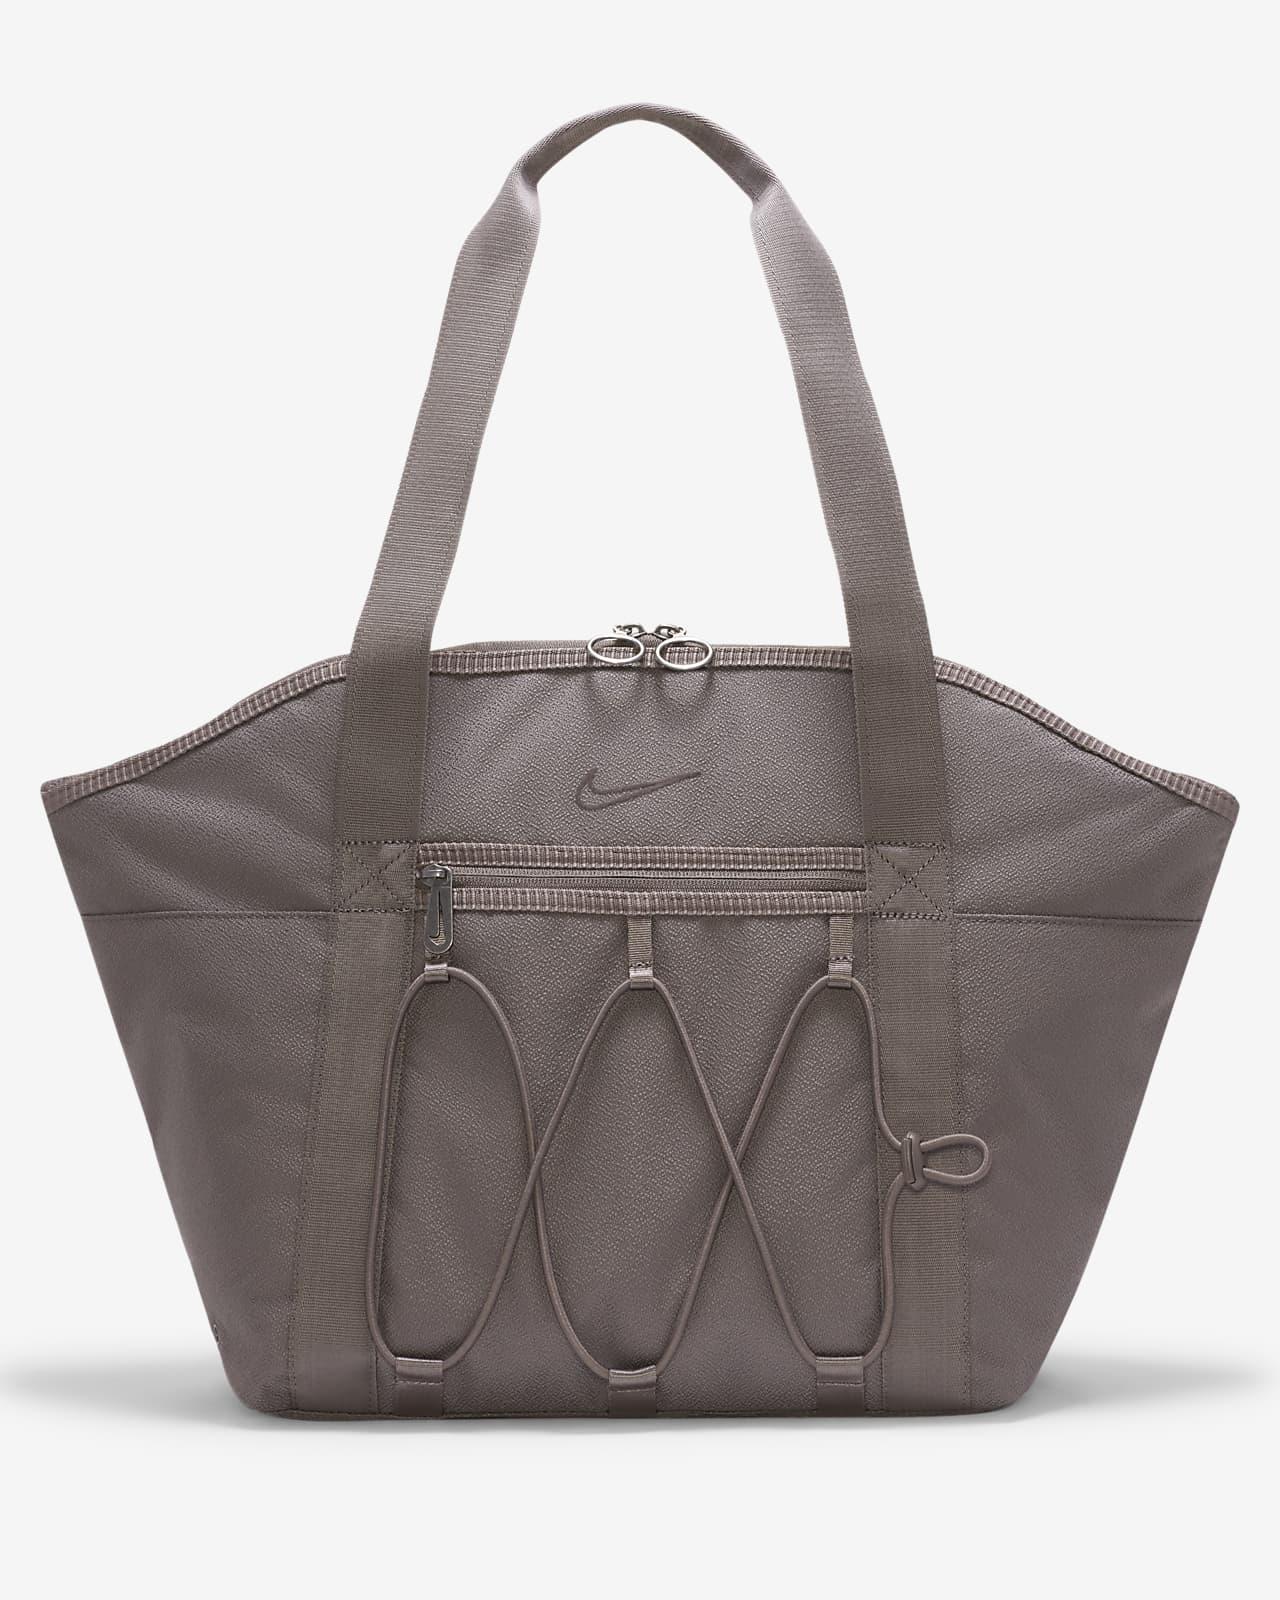 Nike One Women's Training Tote Bag